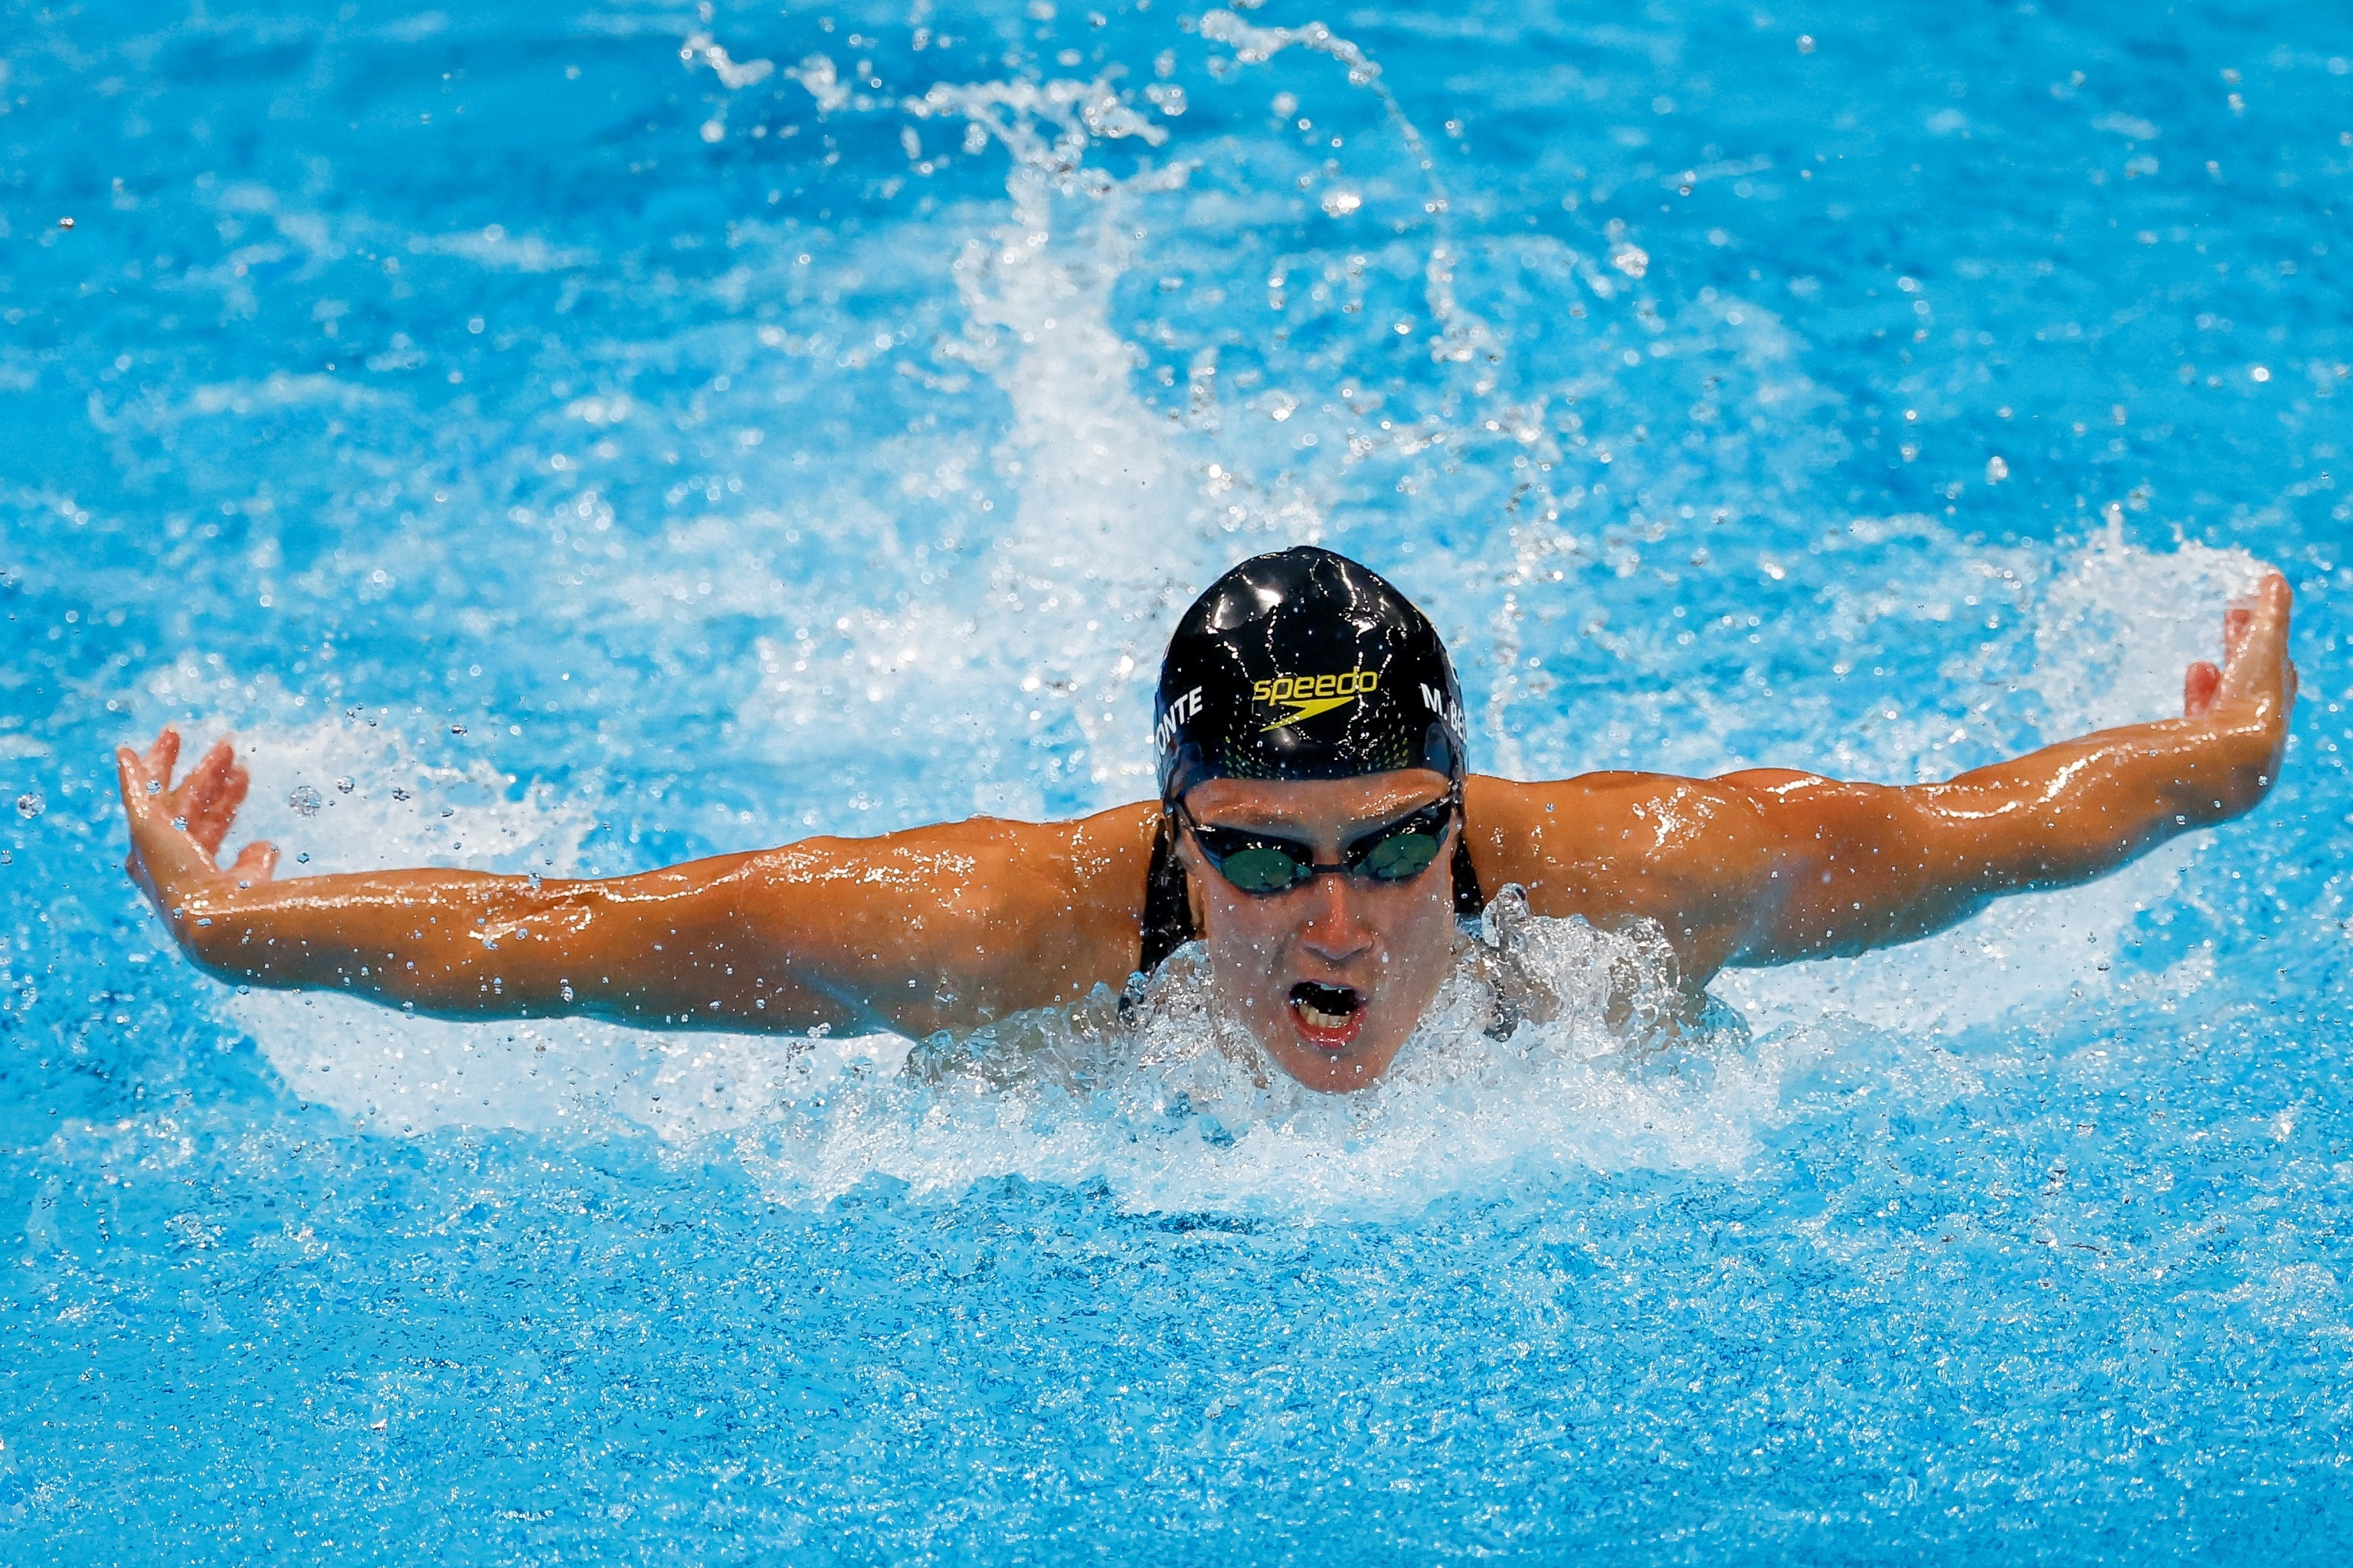 Mireia Belmonte - Natación - Juegos Olímpicos 2021 - Tokio 2020